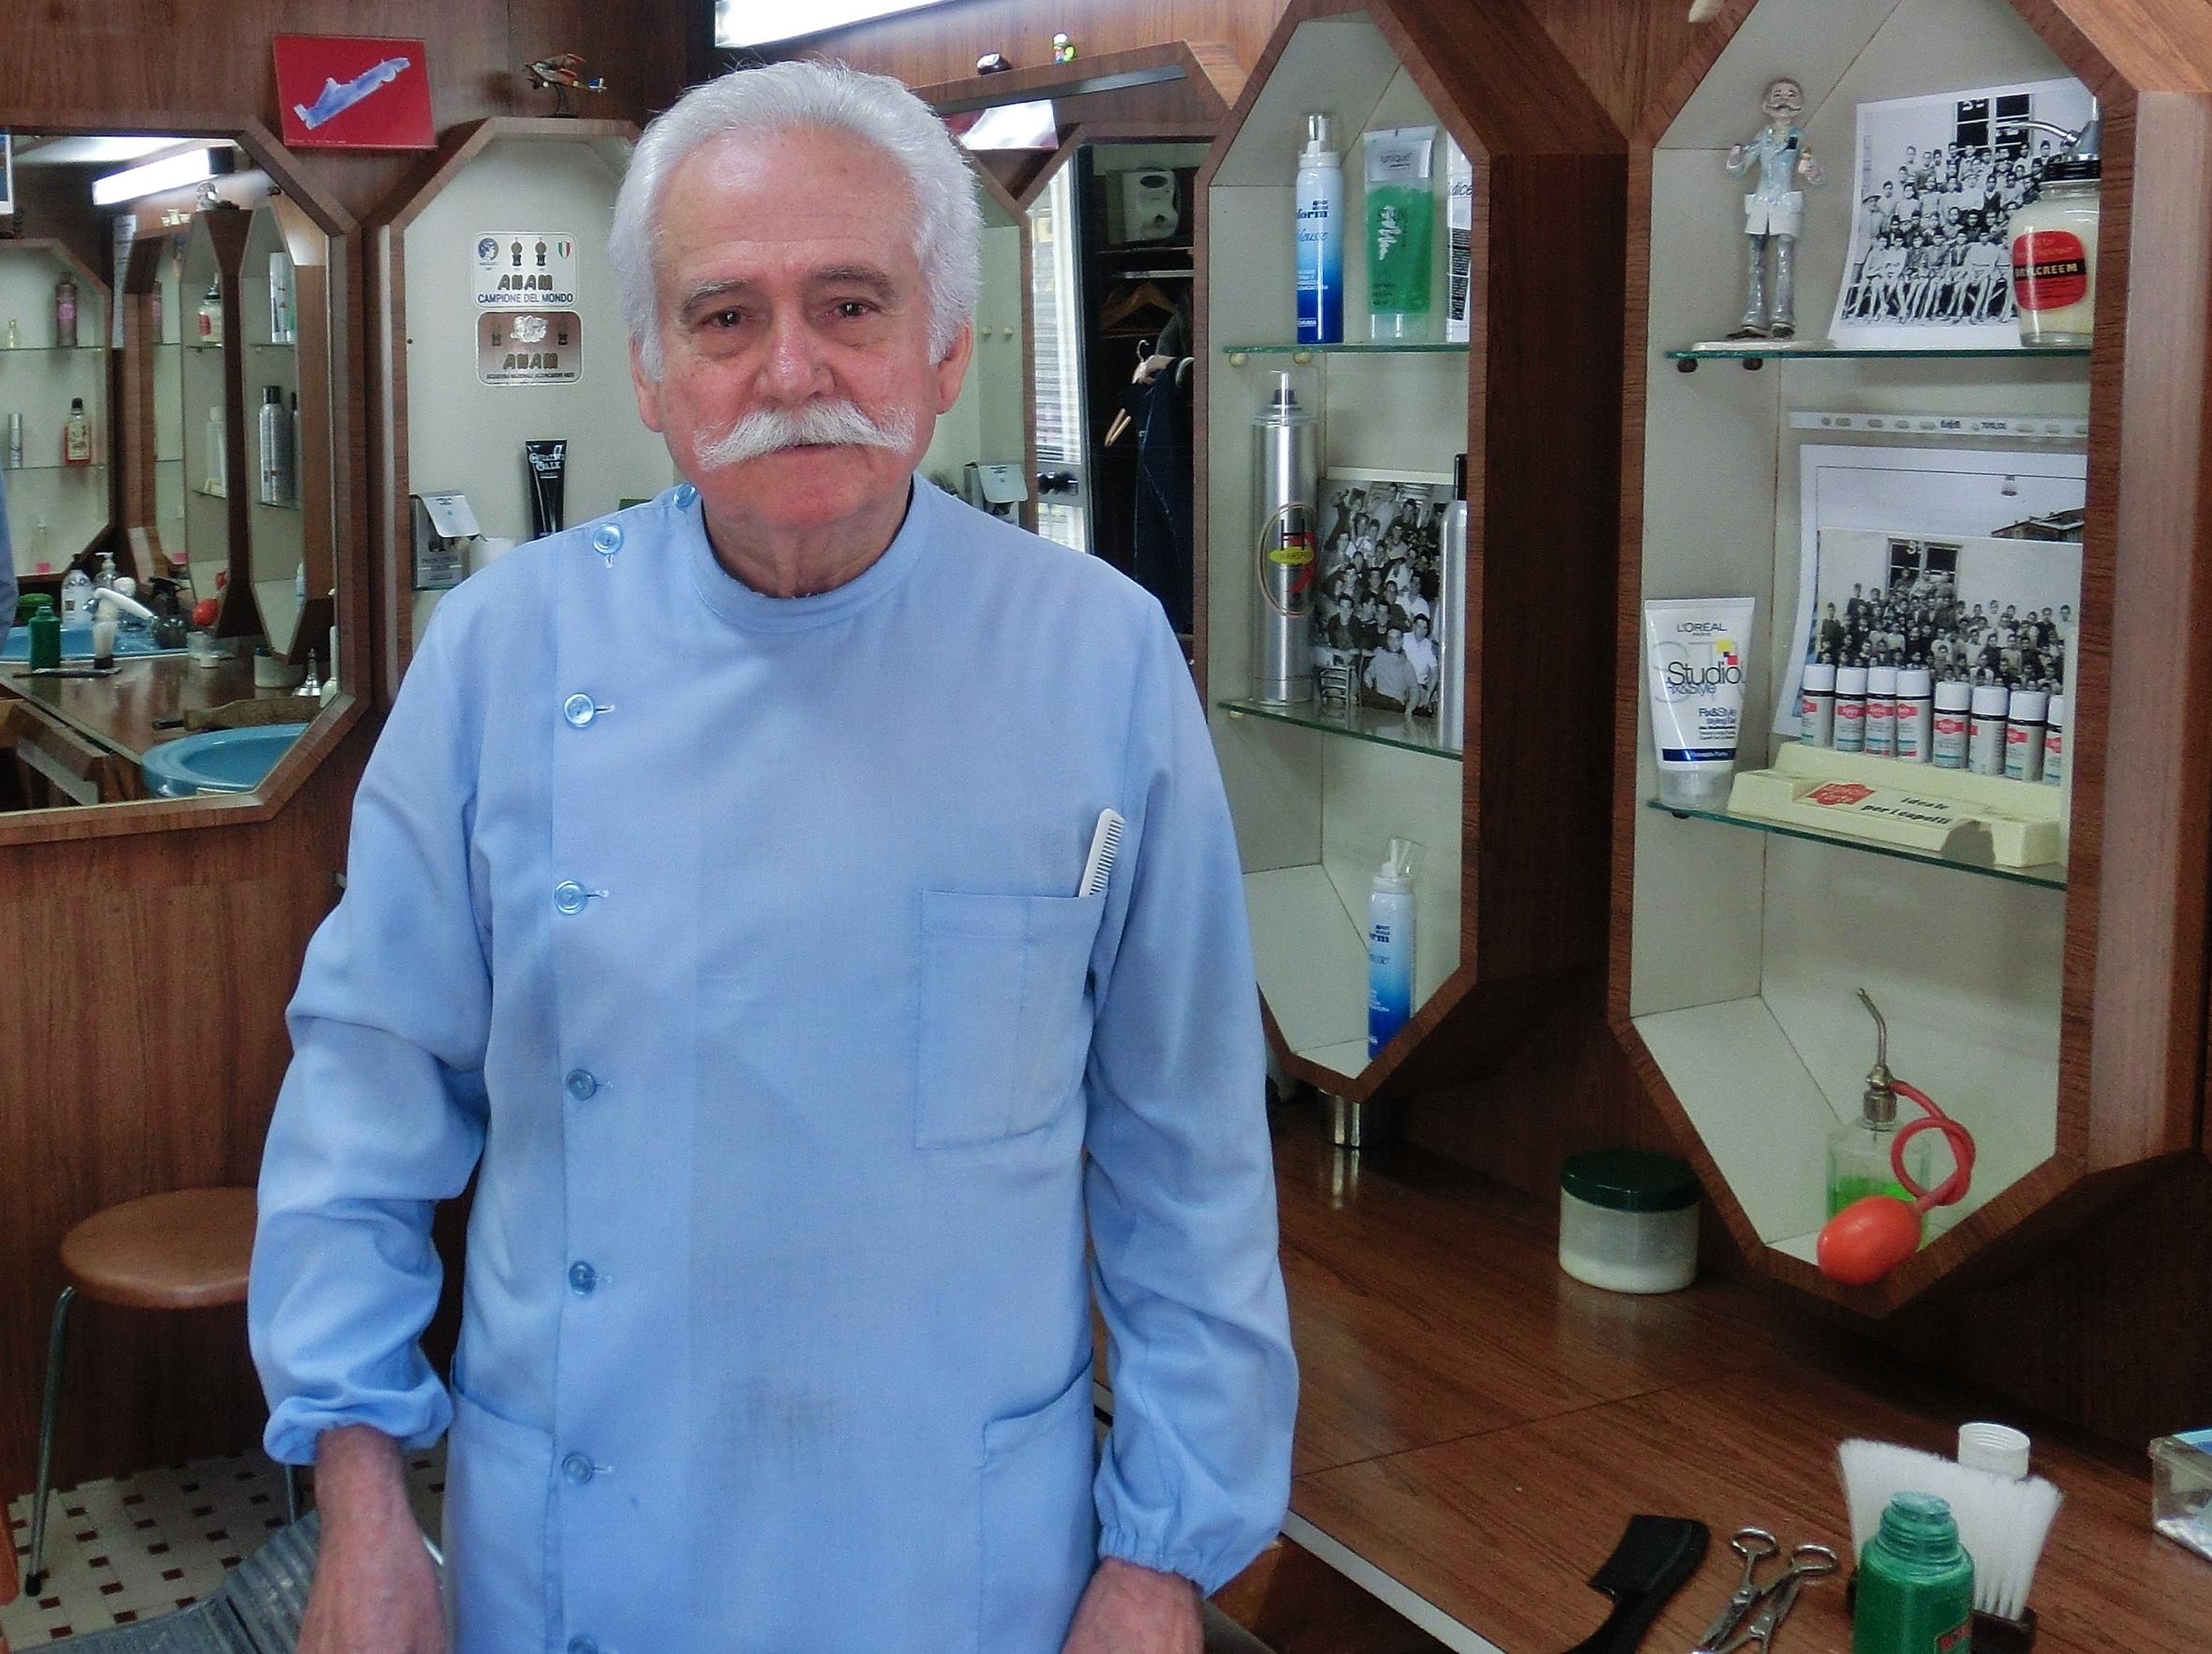 Barber In Italian : Ode to the Italian Barbershop martincooney.com sculptor